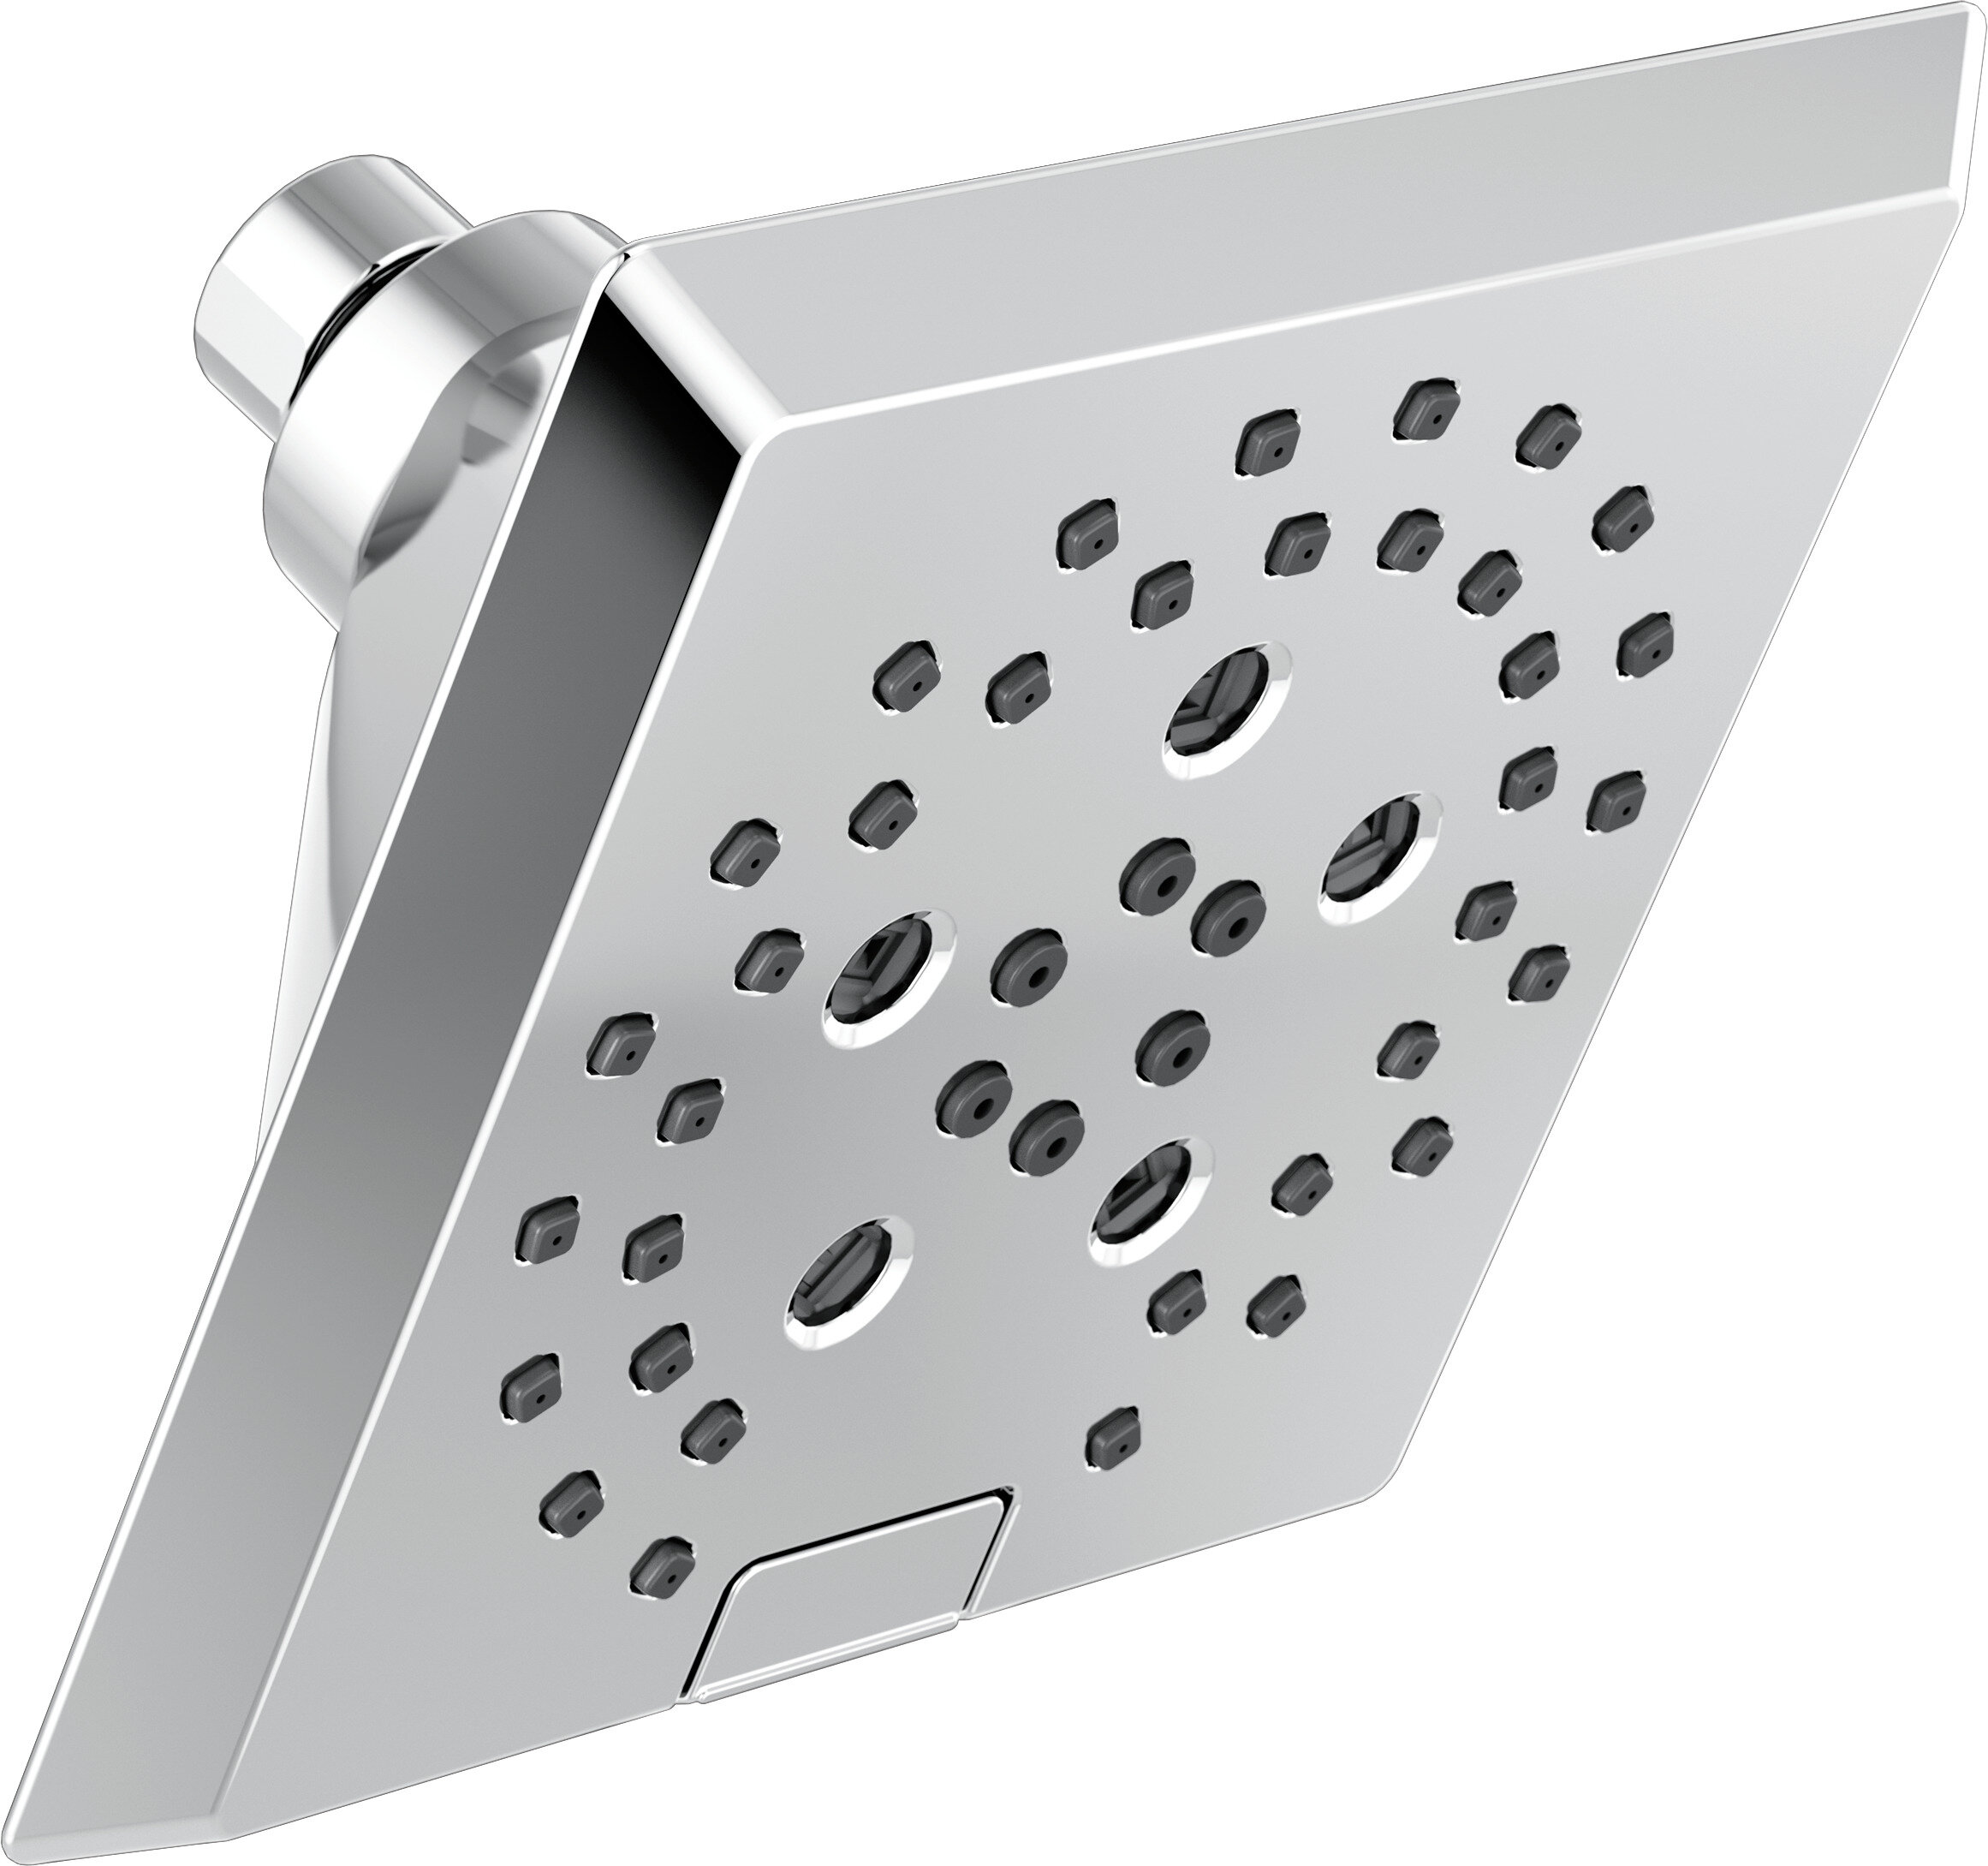 flow high showerhead best s low have ceiling bathroom speakman gpm head a rainforest rainfall lowes shower using rain